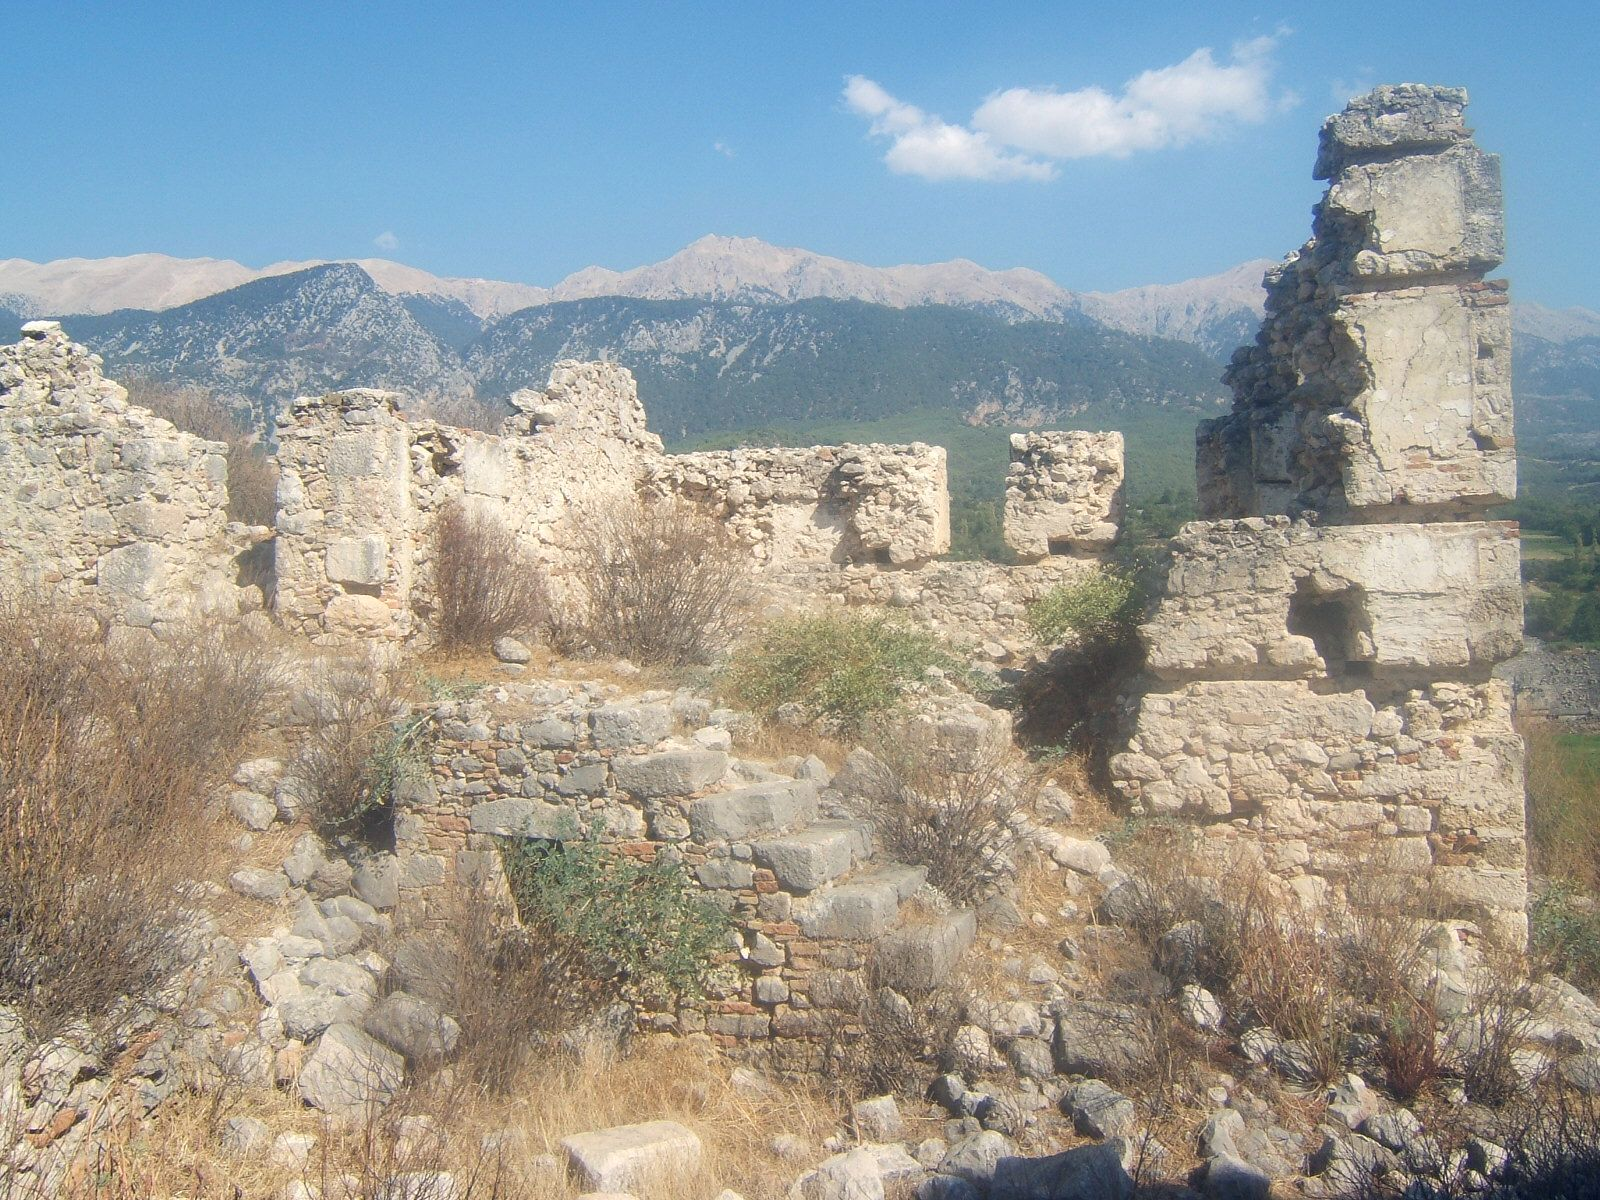 File:Tlos ruins Turkey2.jpg - Wikimedia Commons